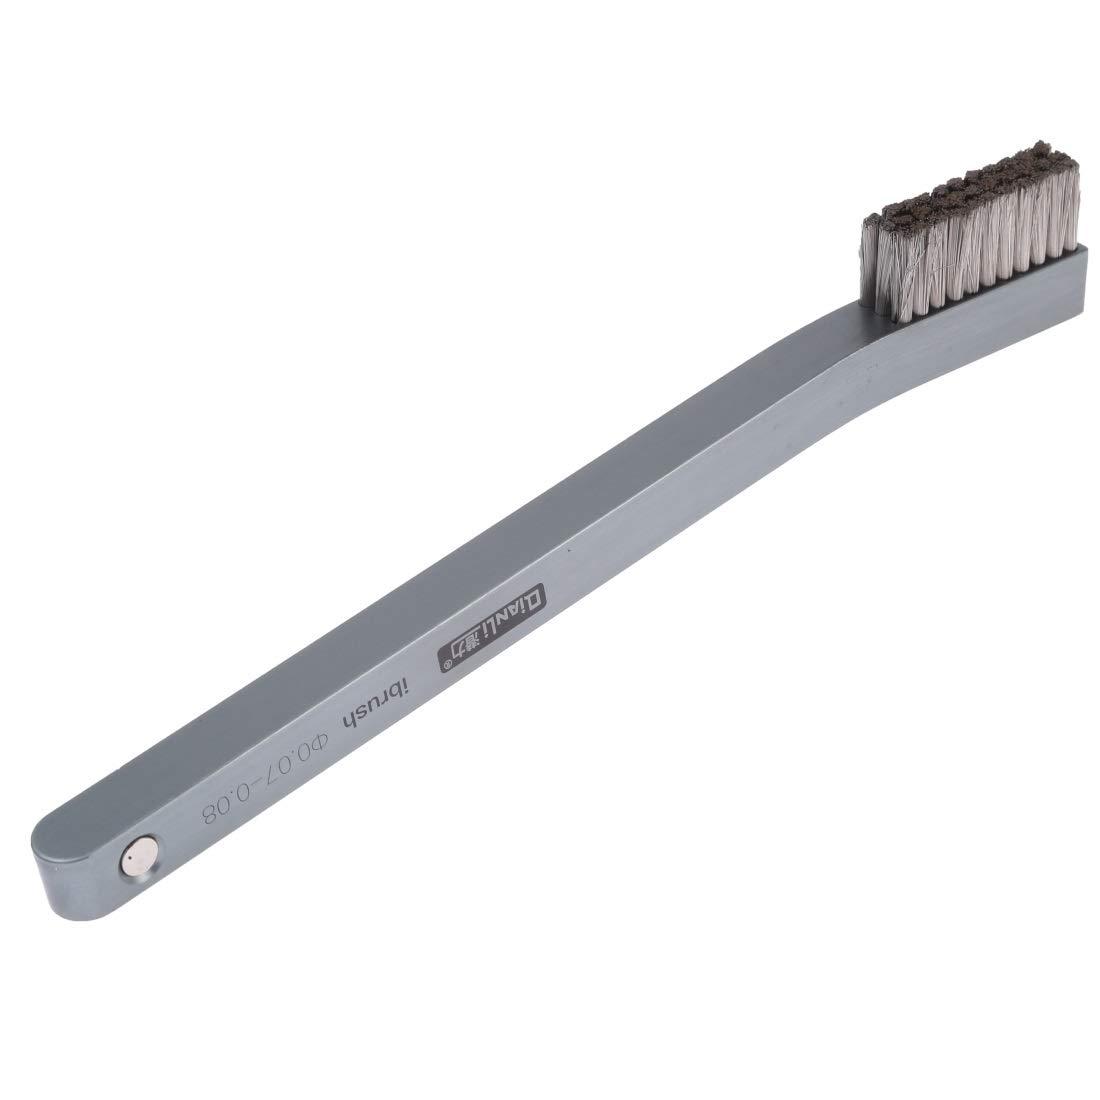 Hyx Repair Tool iBrush Multifunctional High Temperature Resistant Steel Brush for Cleaning/Polishing/Grinding/Degumming